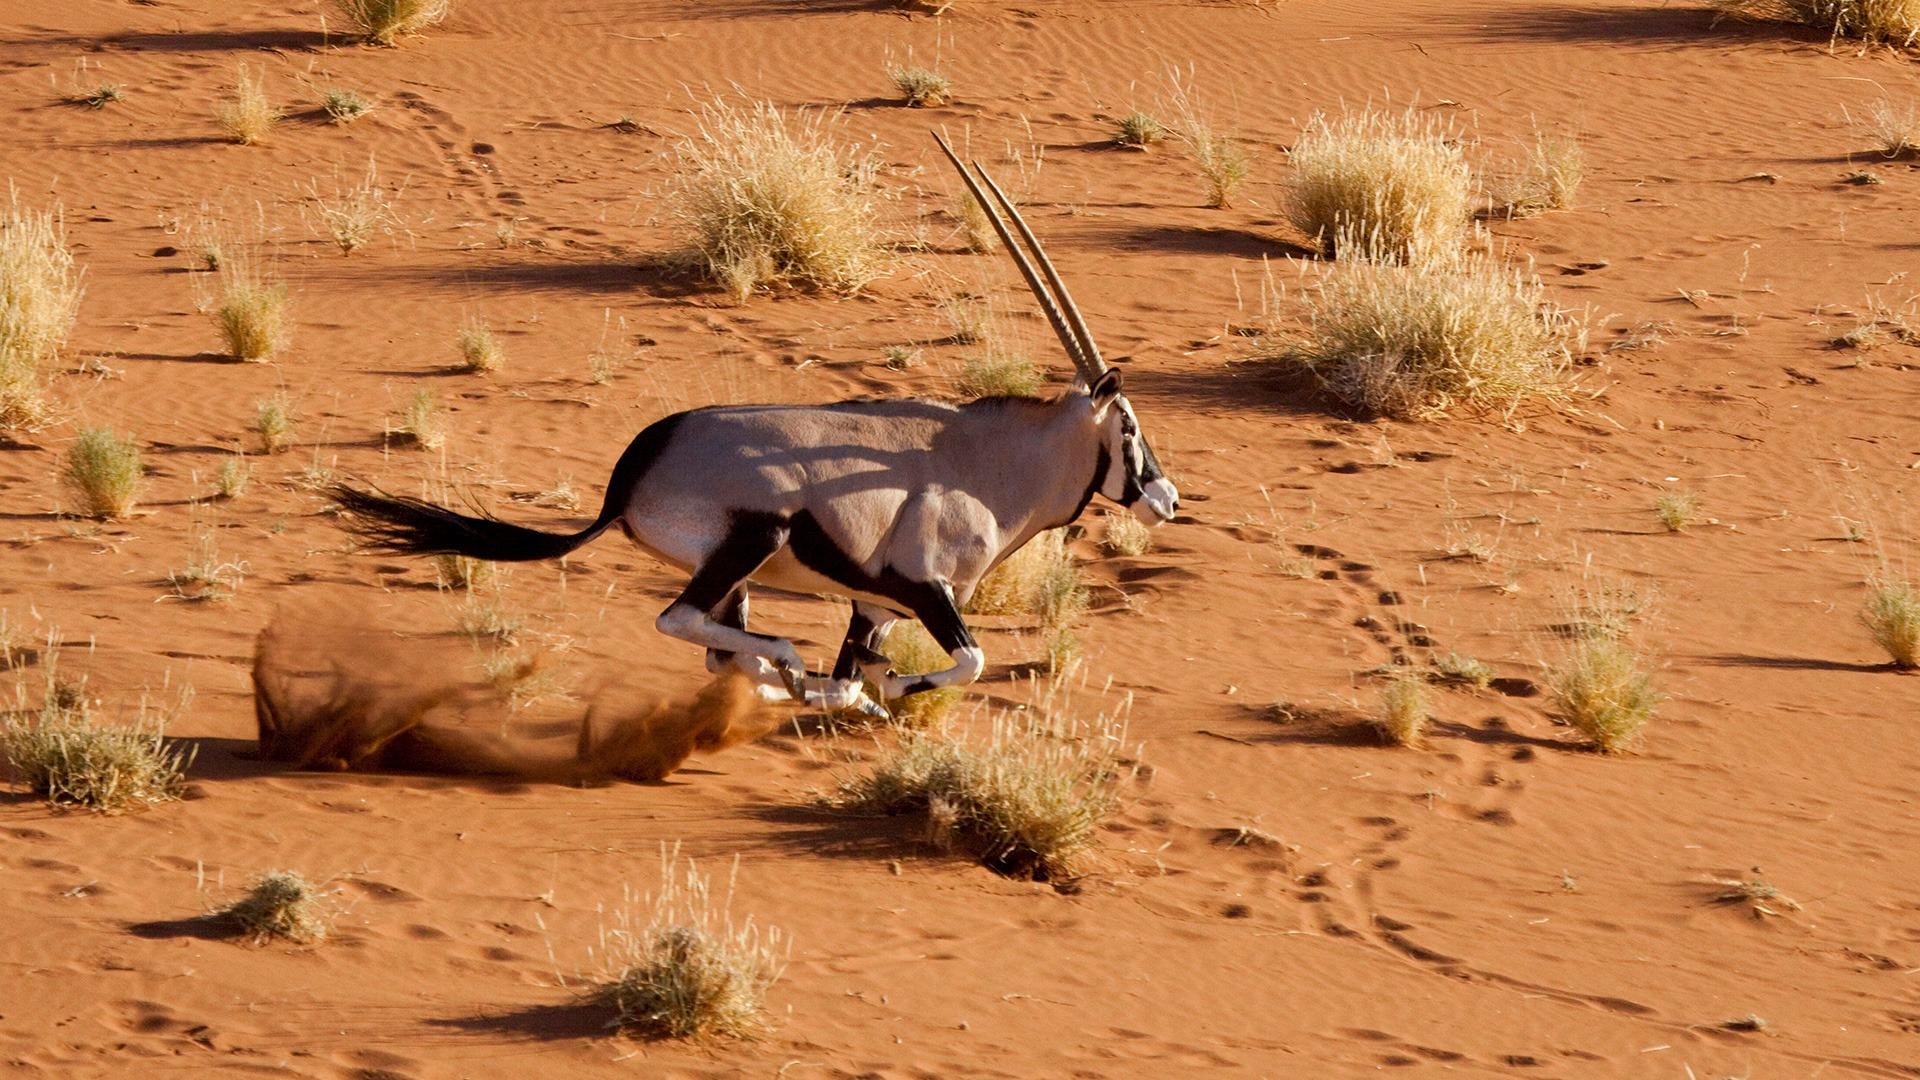 Oryx running in Sossusvlei, Namibia